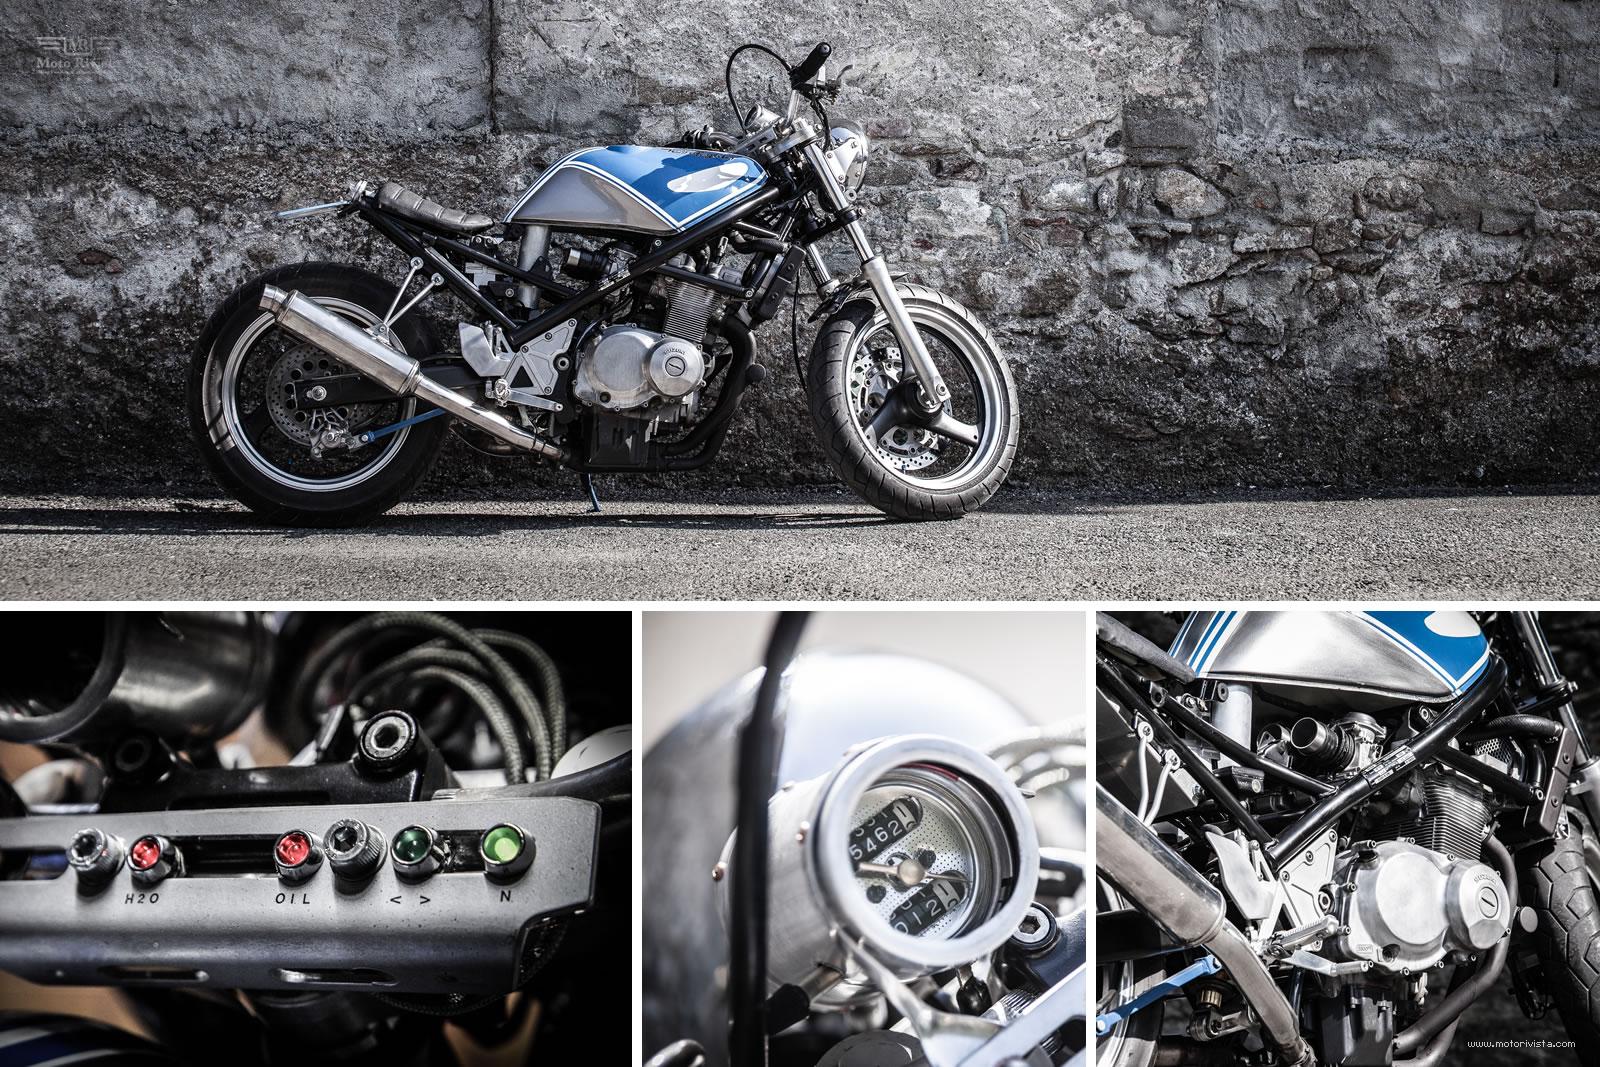 Bandits raras vistas por ahí (web) Italian-custom-Suzuki-GSF400-9